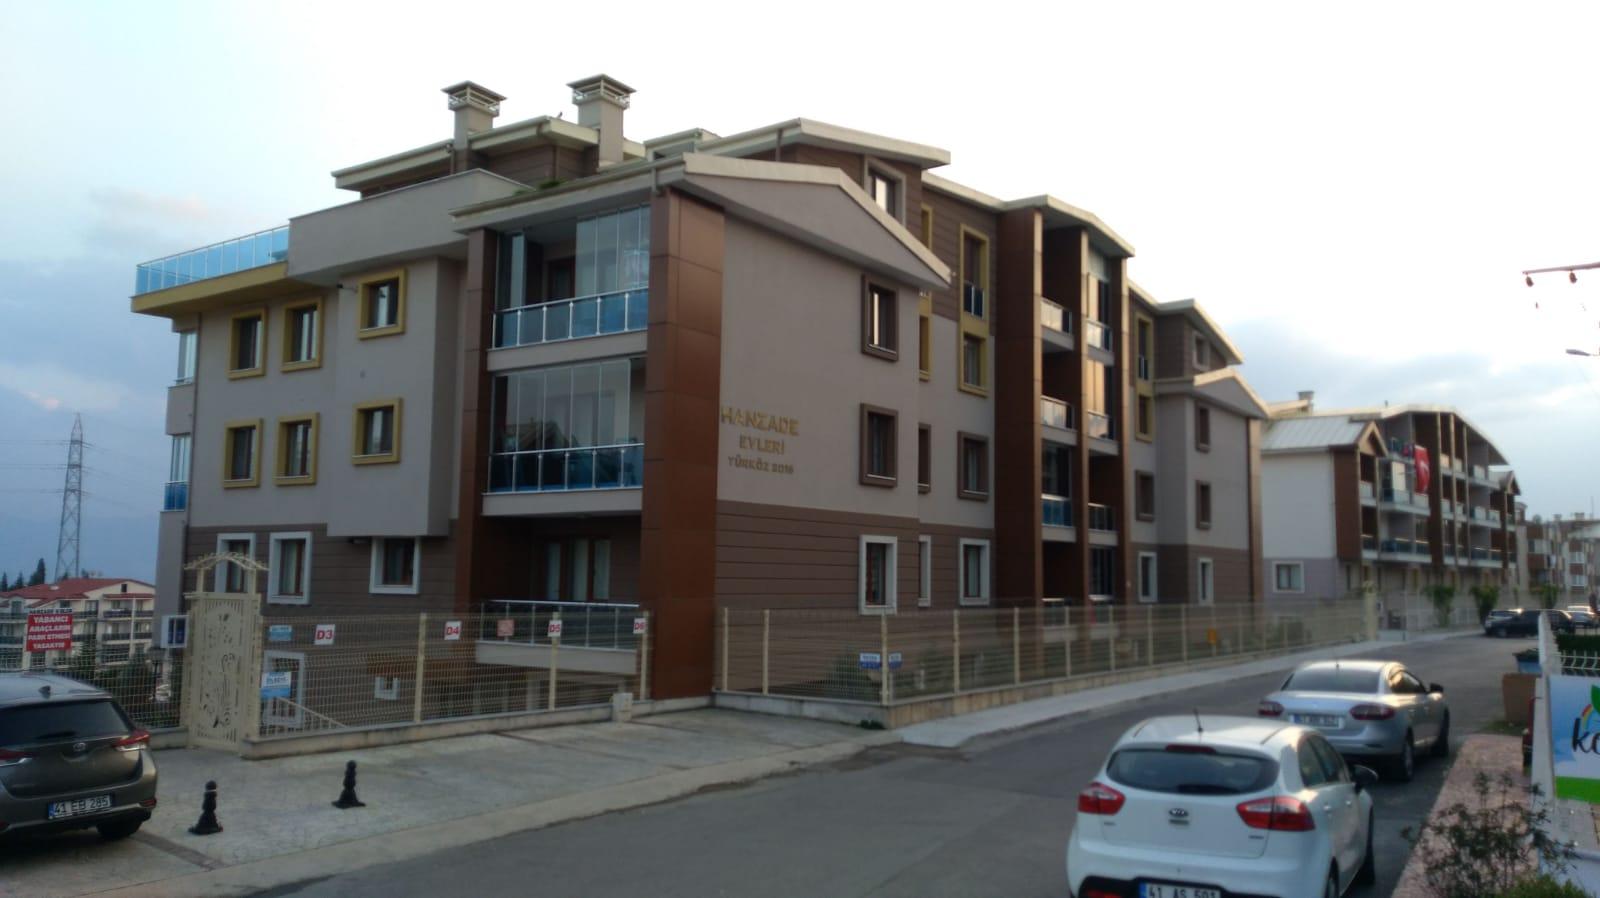 Hanzade Evleri